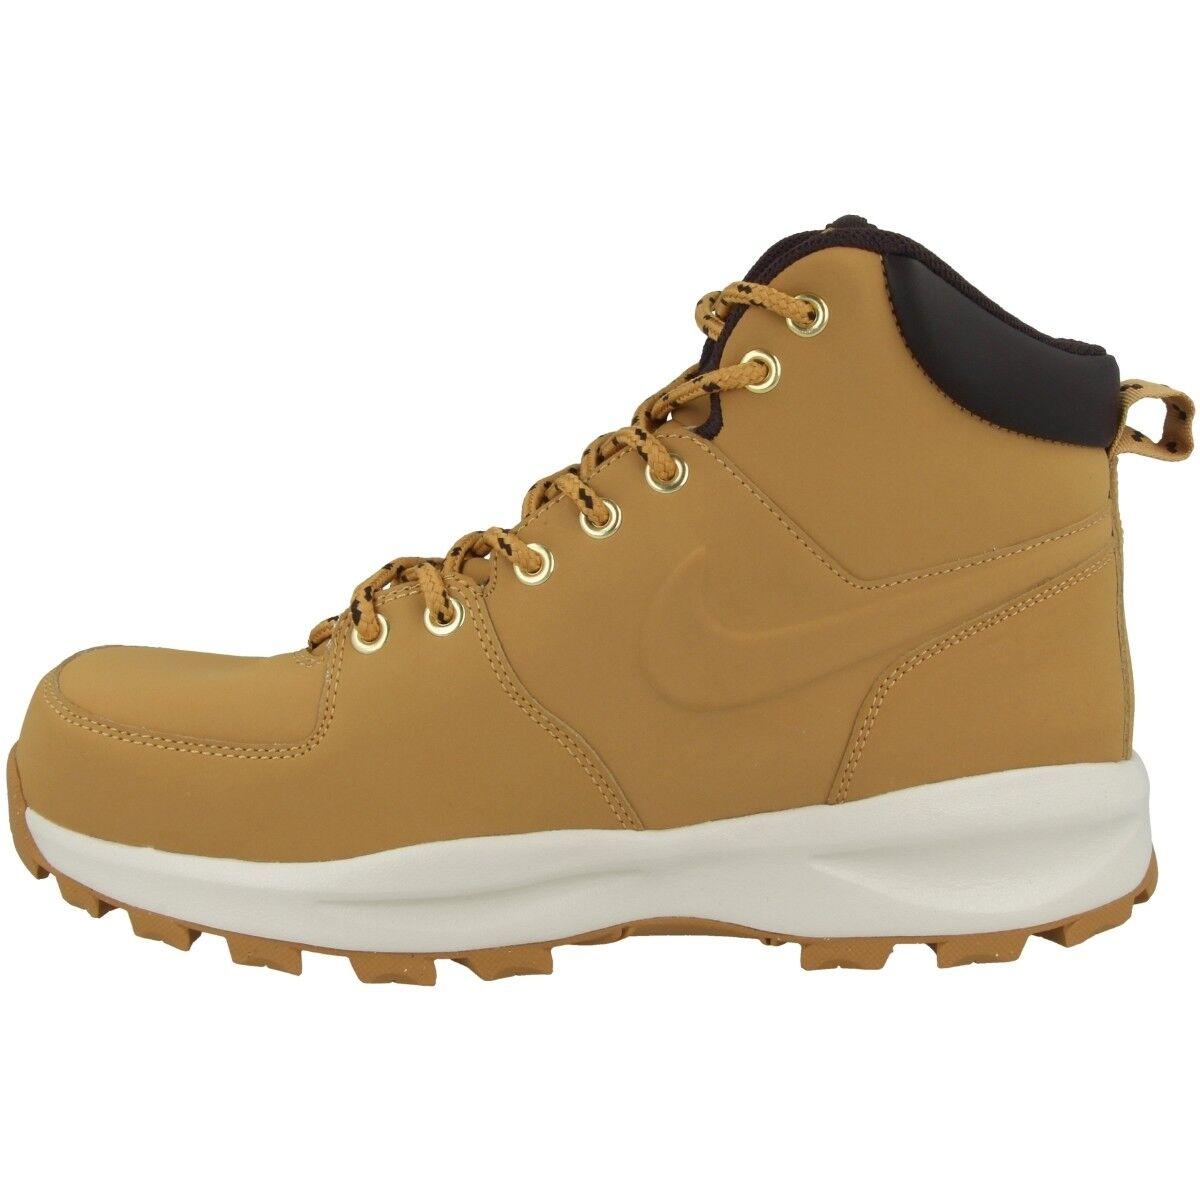 Nike Manoa leather en Boots Bottes Chaussures en leather cuir Haystack Brown Mandara 454350-700 d4f6e8